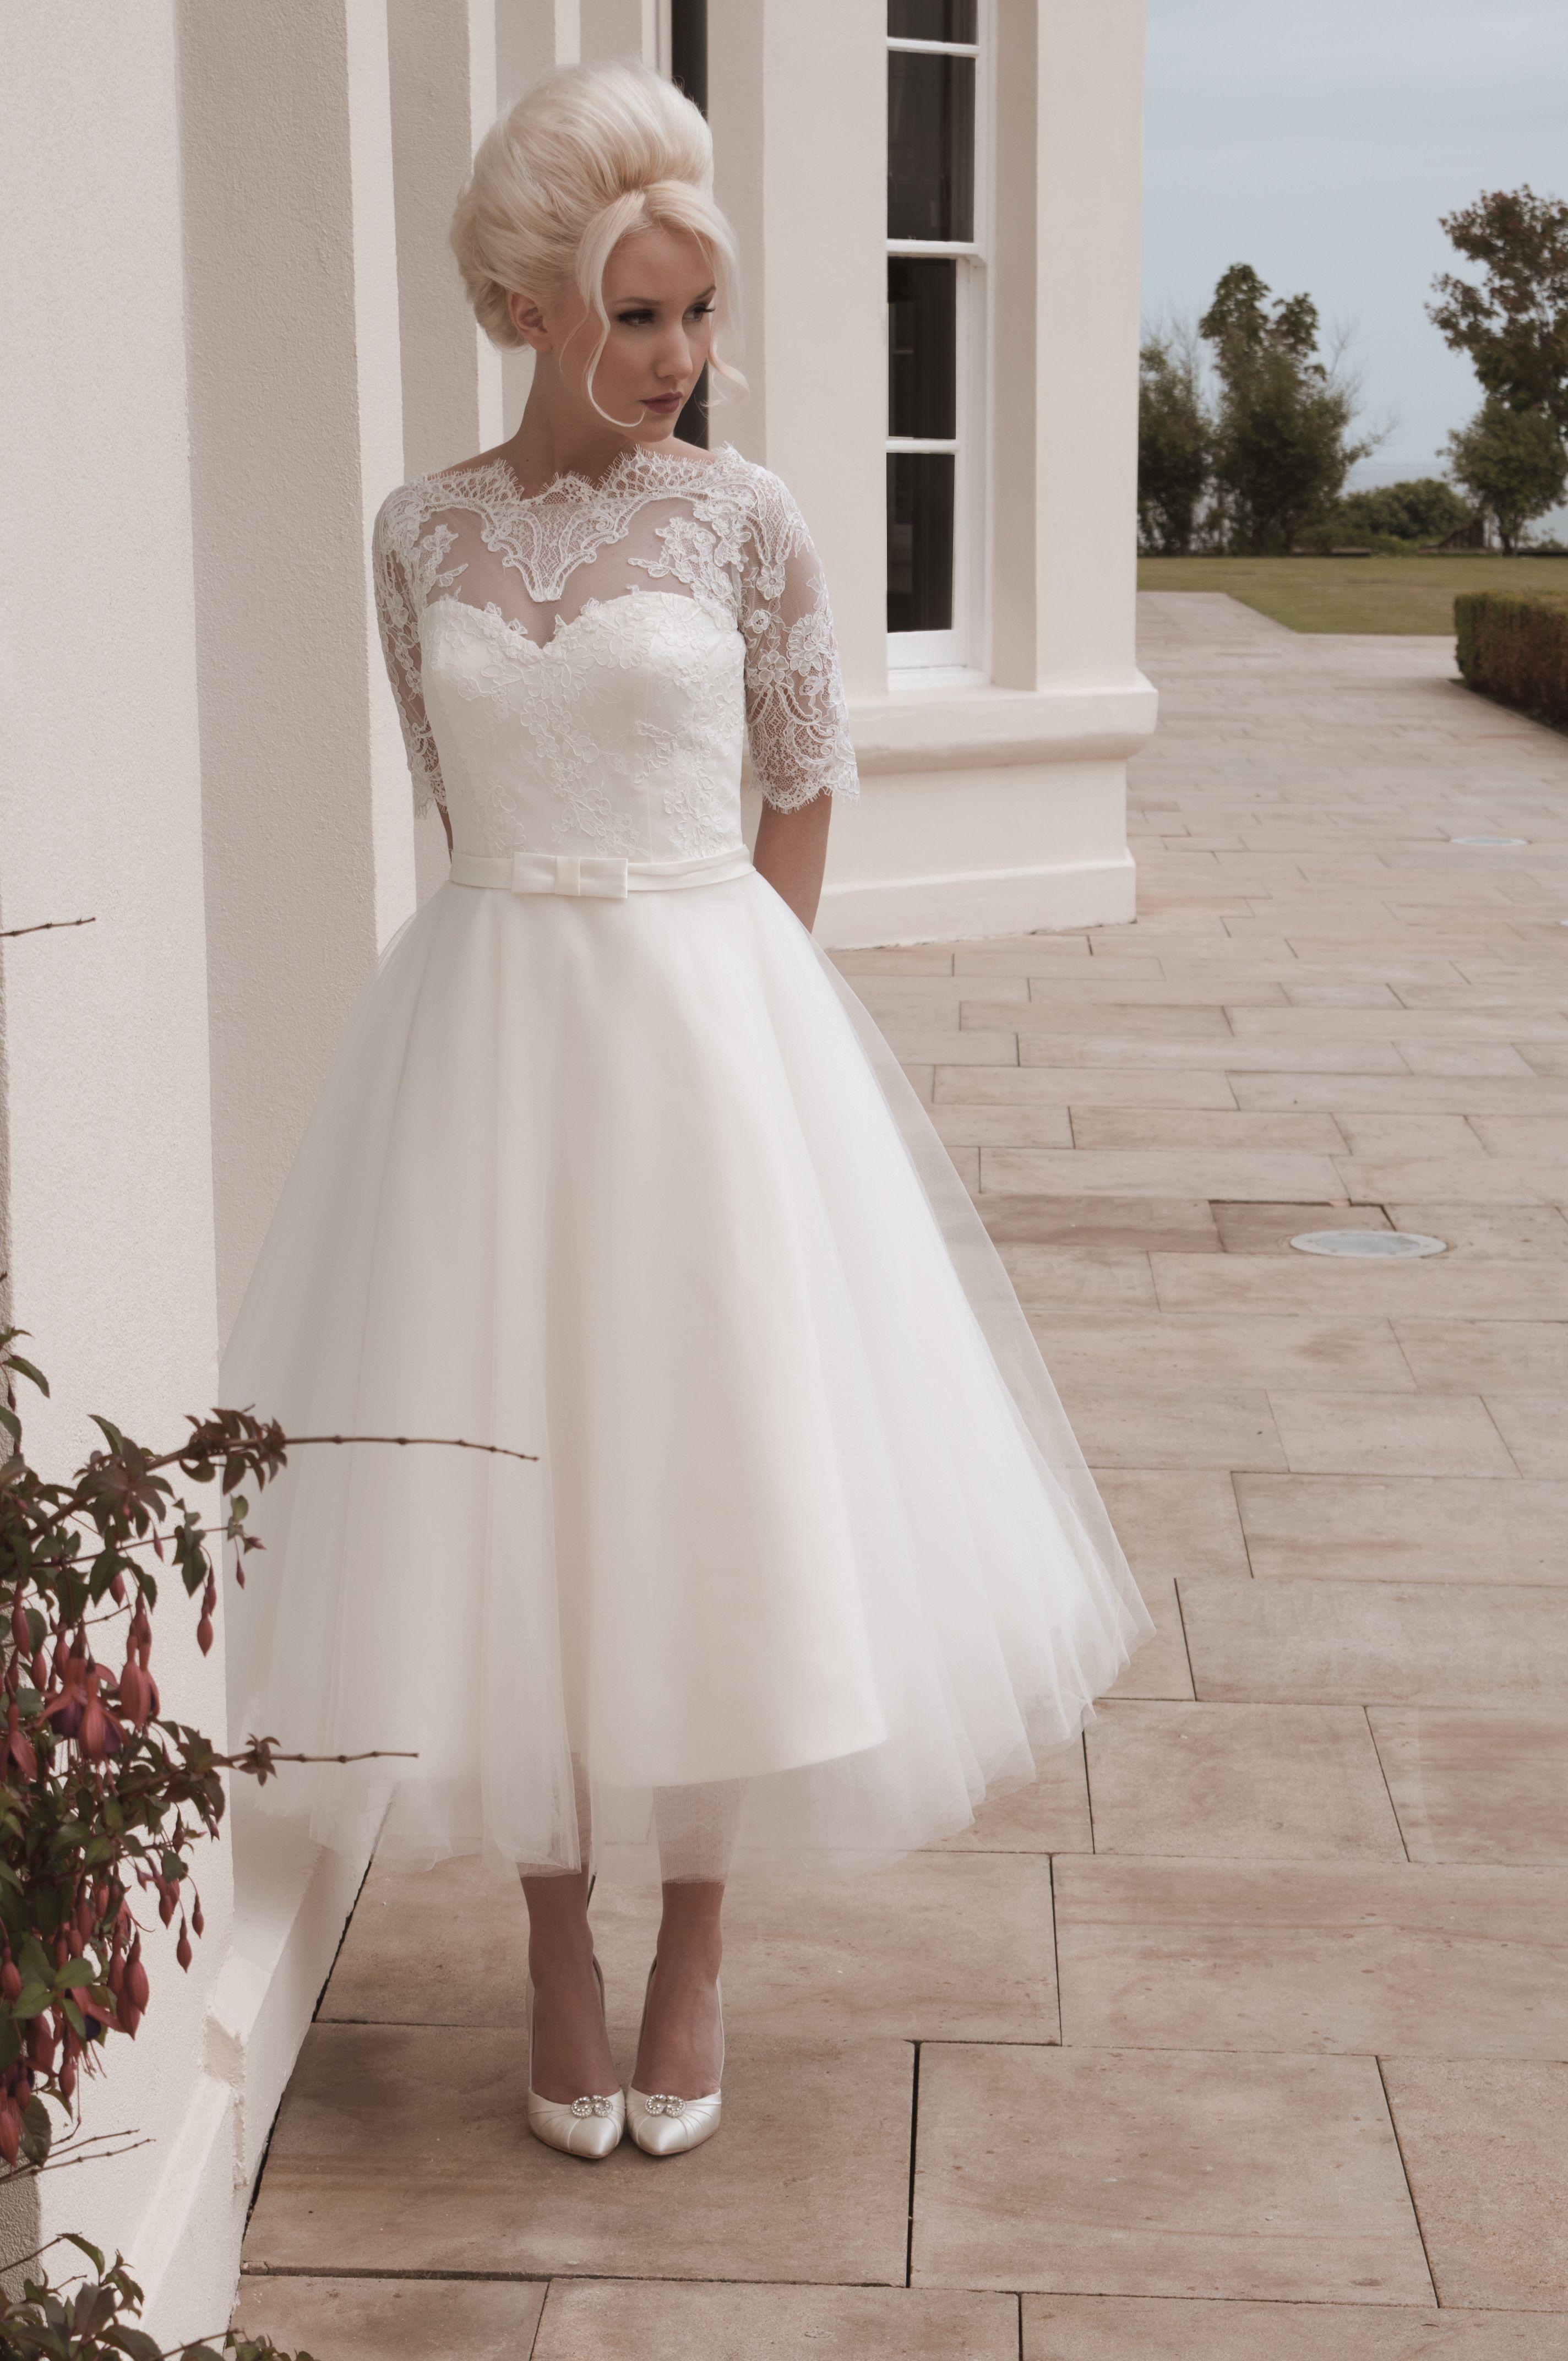 Darla Beautiful Soft And Feminine Tulle And Lace Short Calf Length Wedding Dress Dar Short Wedding Dress Tea Length Wedding Dresses Lace Tulle Wedding Dress [ 4288 x 2848 Pixel ]